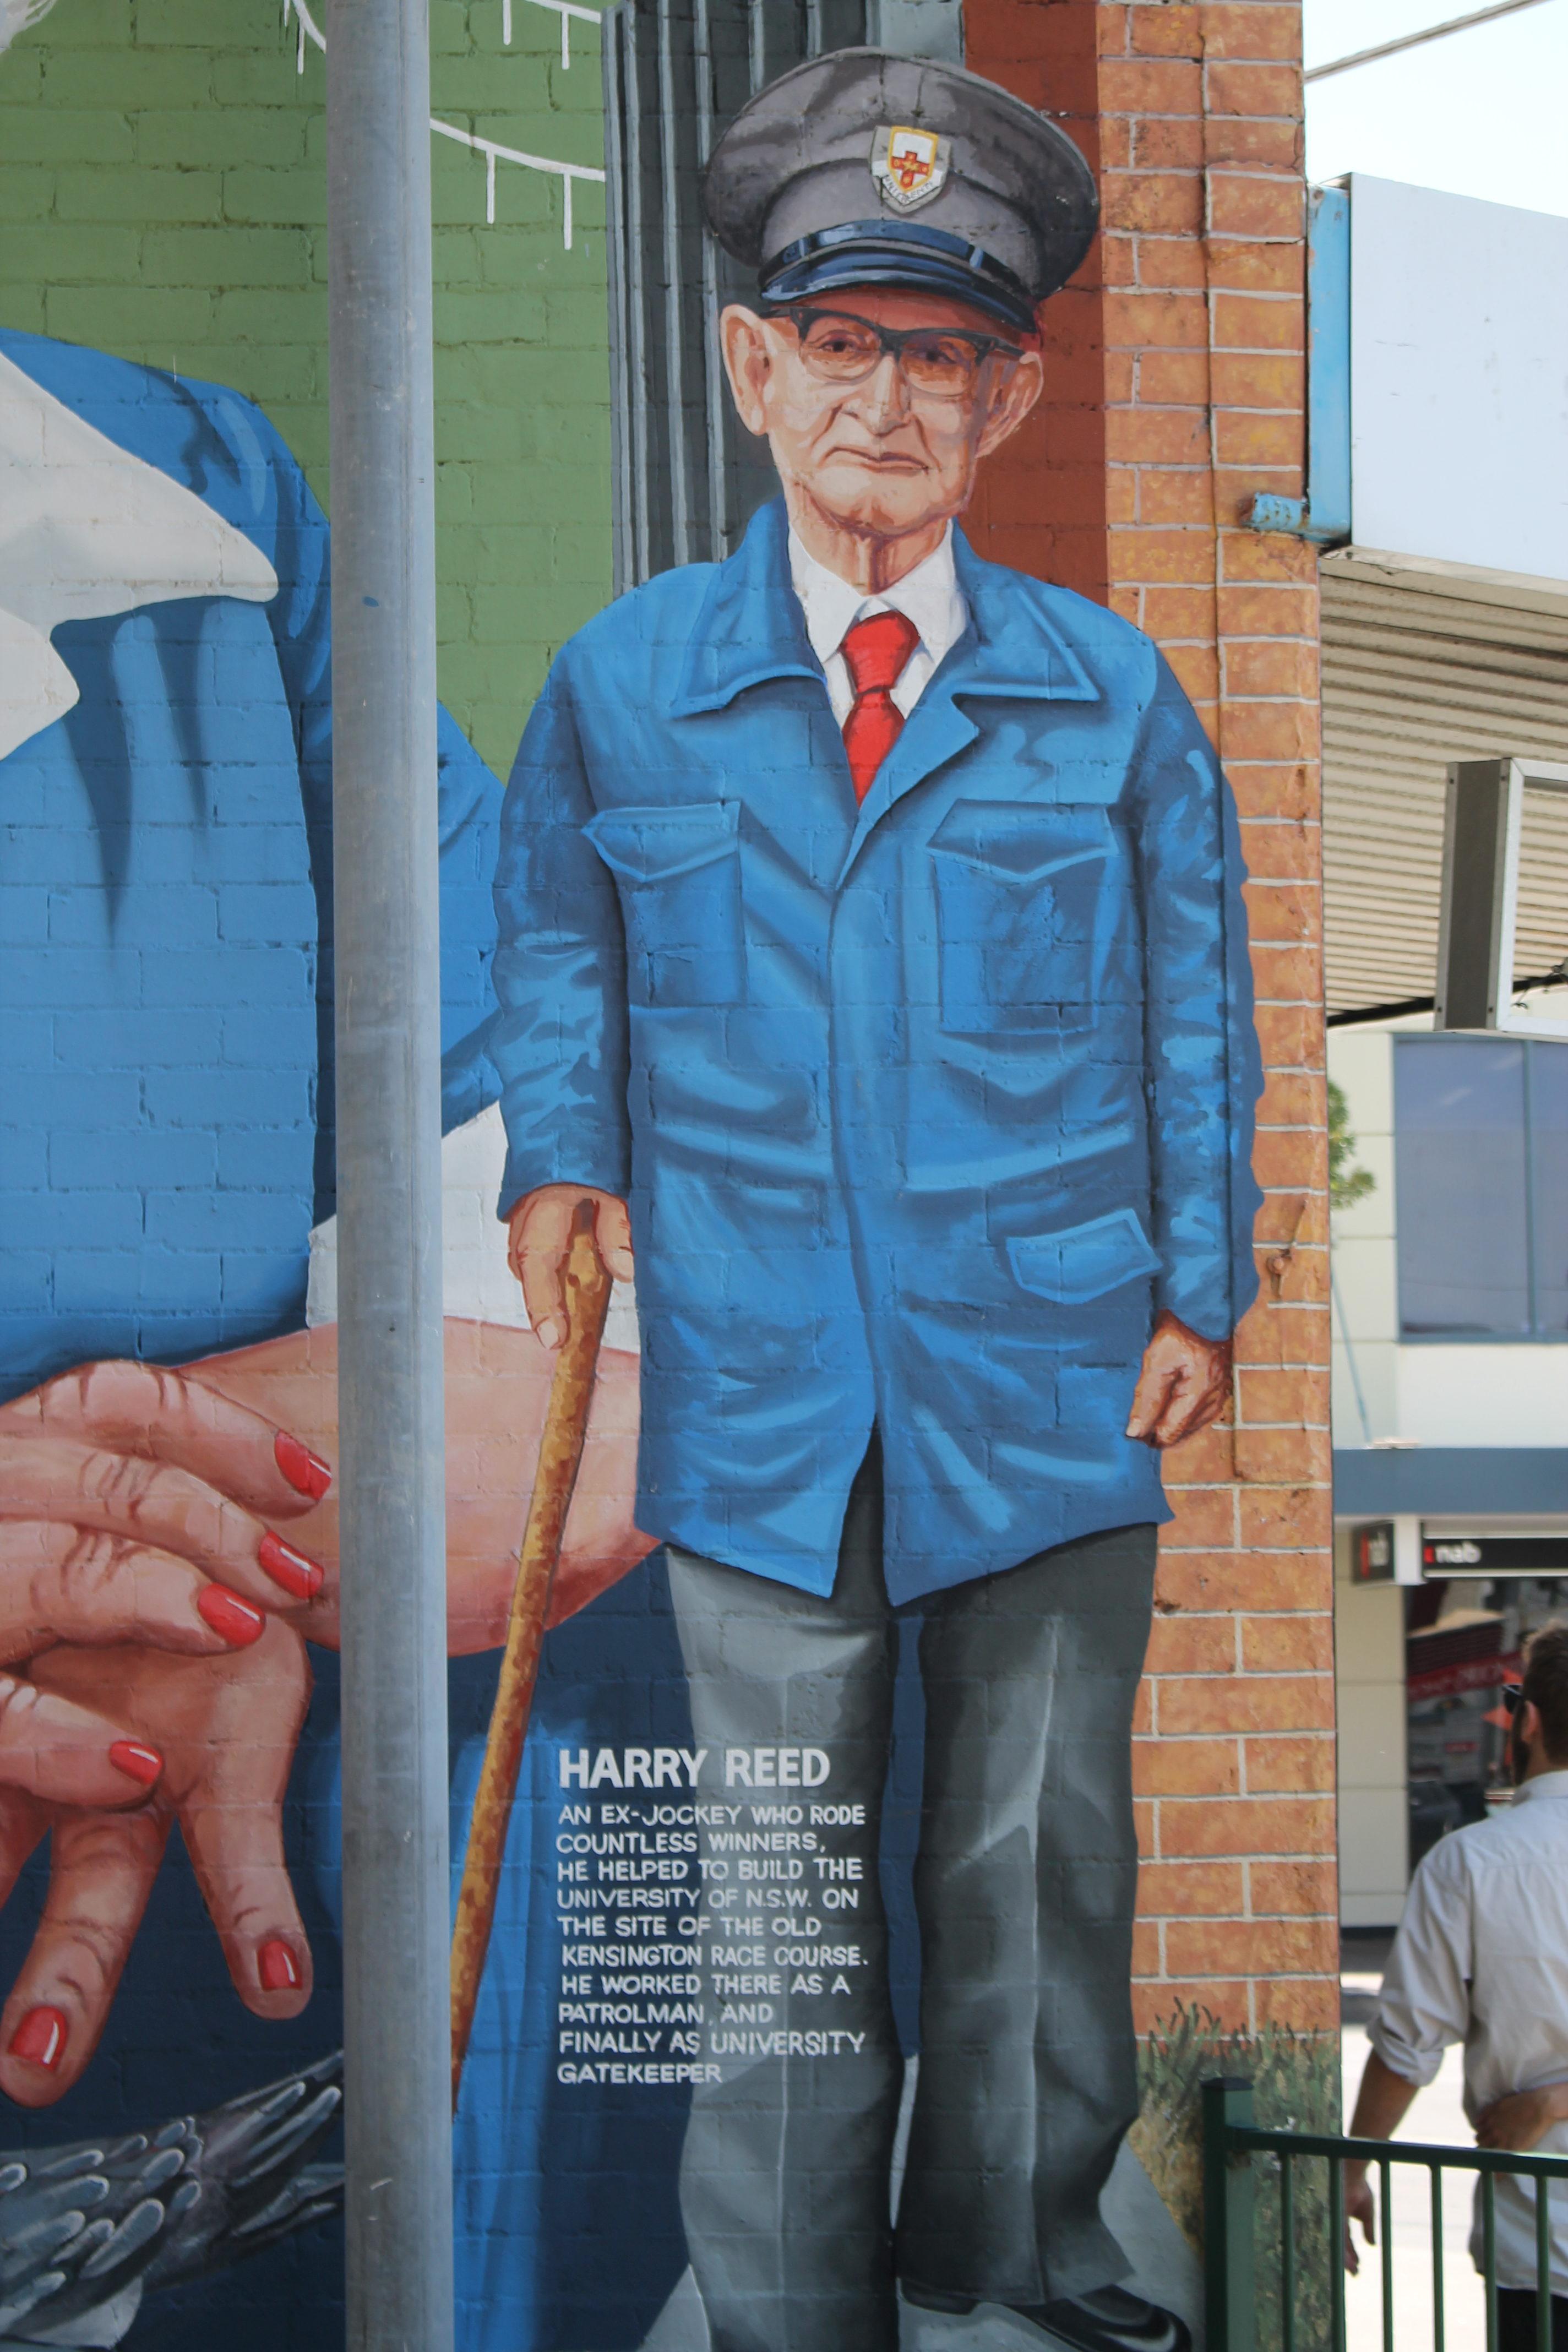 The Artwork on the Walls At Randwick